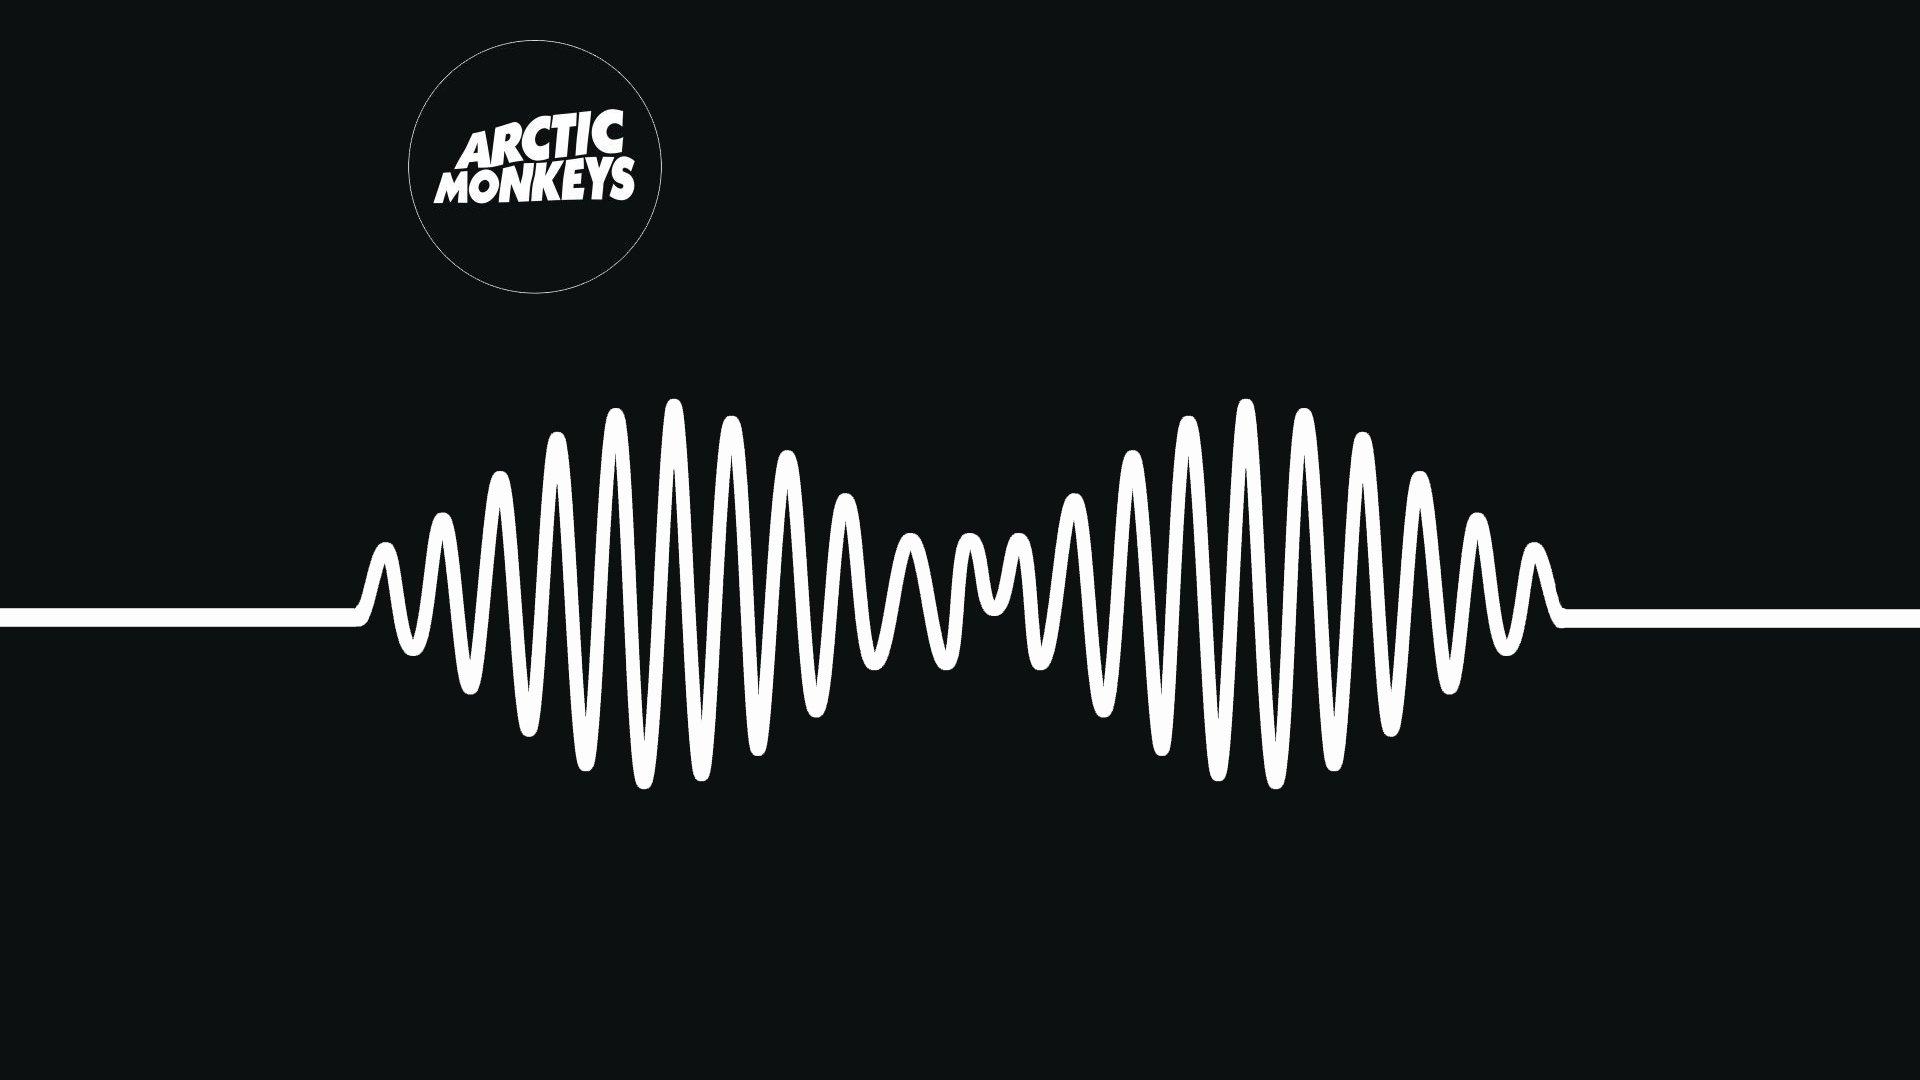 Arctic Monkeys Full HD Fond d'écran and Arrière-Plan ...